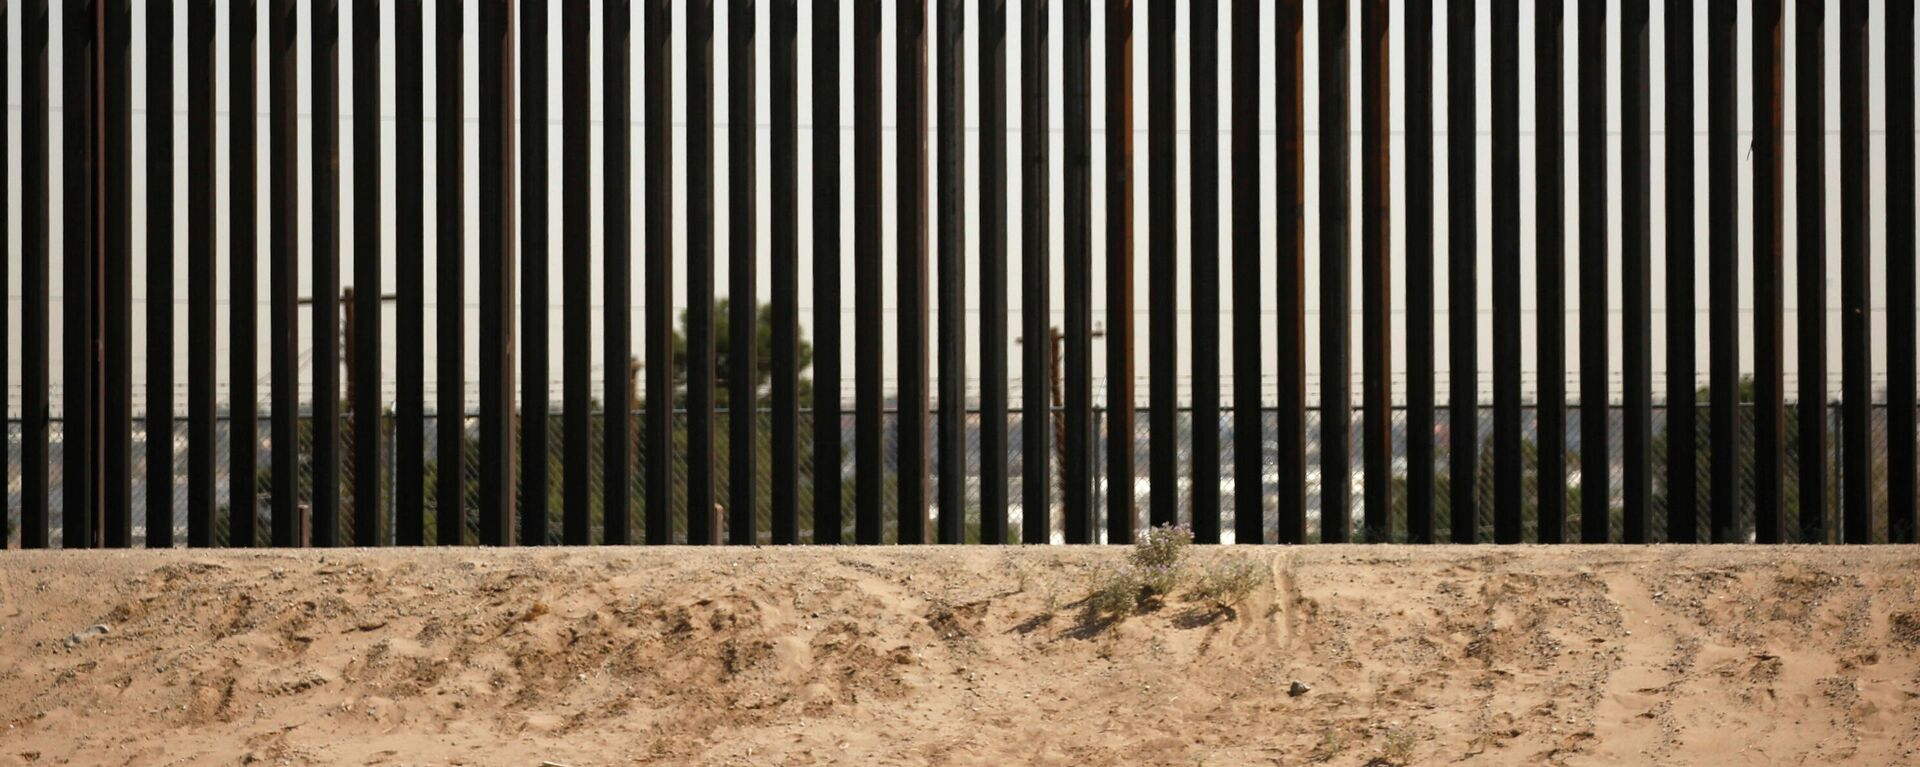 Muro fronterizo entre EEUU y México - Sputnik Mundo, 1920, 18.06.2021